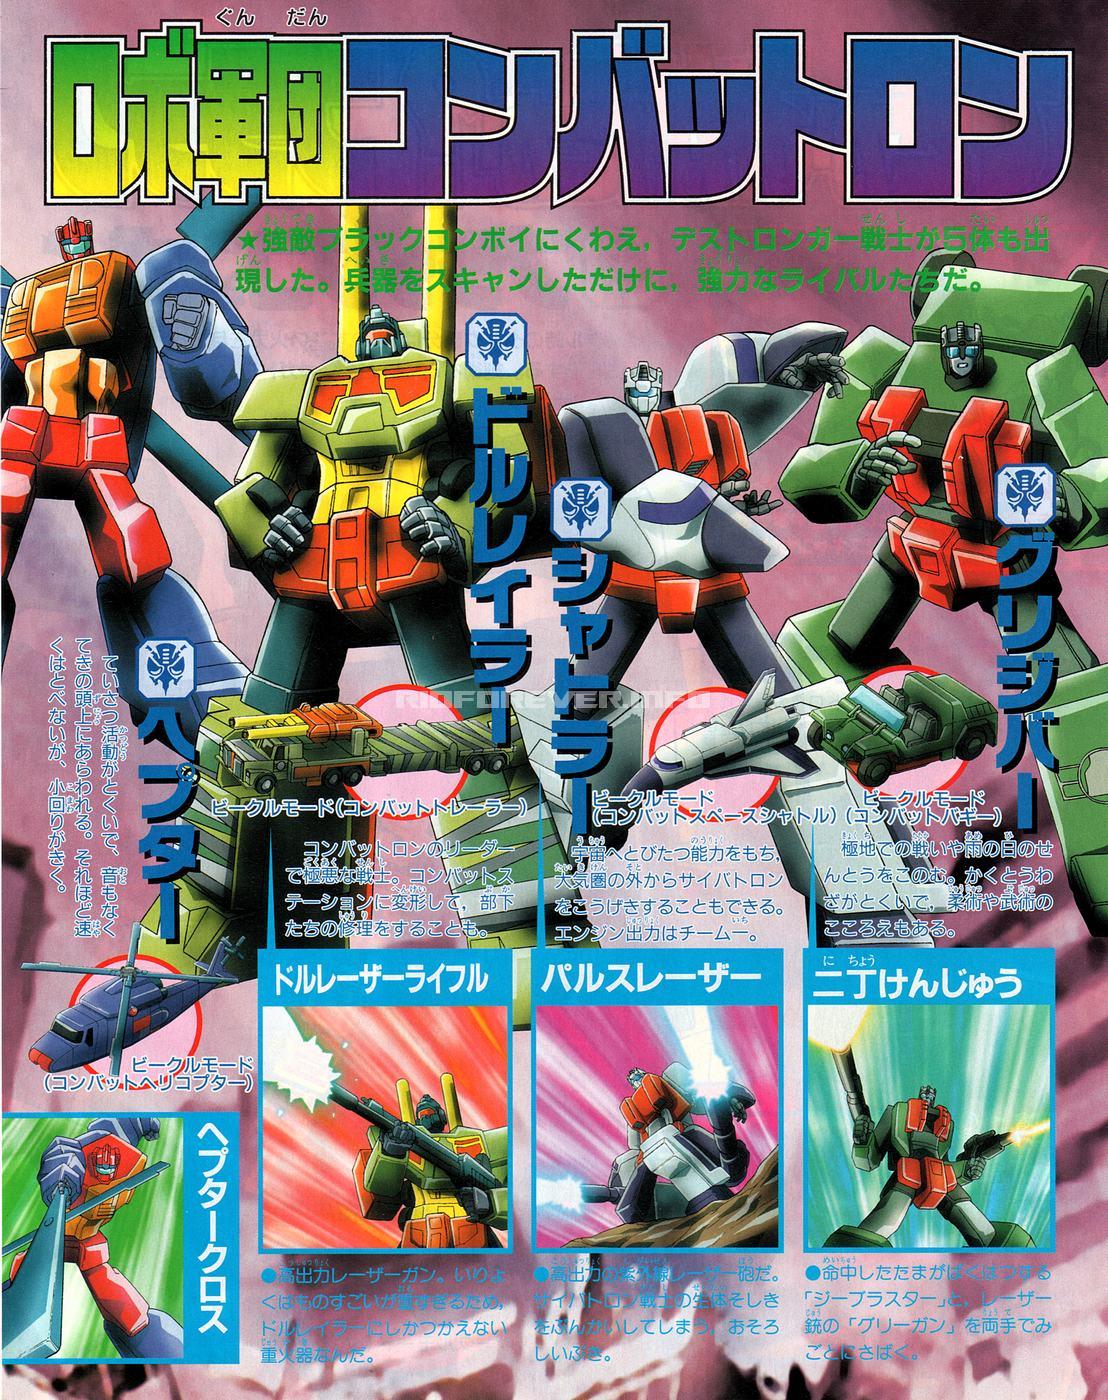 TV Magazine 2000-07-8-1